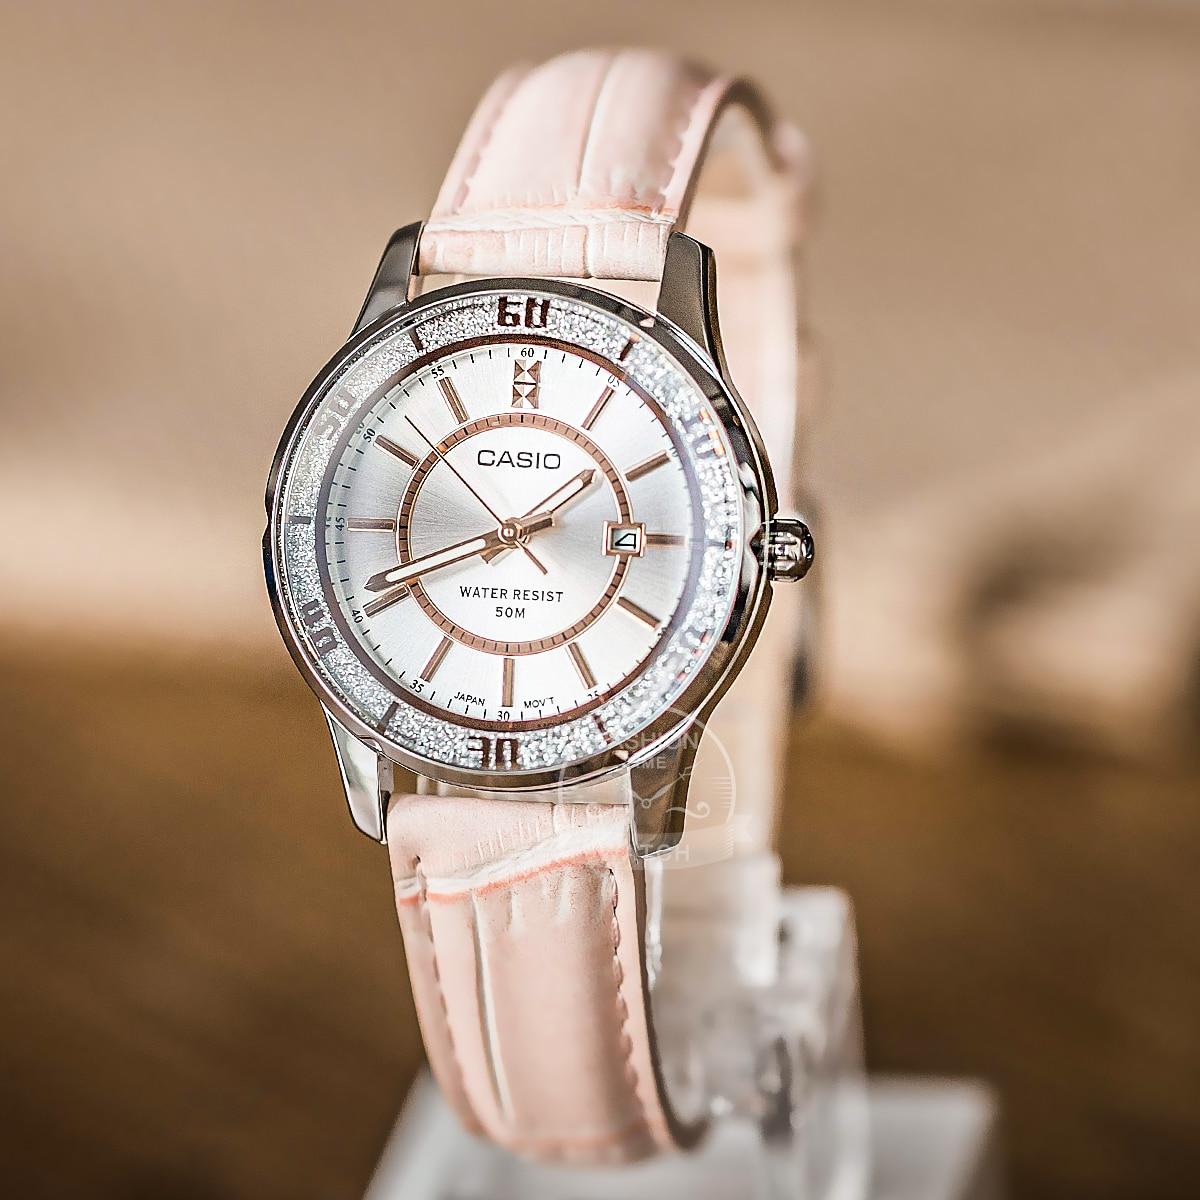 Casio watch women watches top brand luxury set 50m Waterproof Quartz ladies watch women Gifts Clock Sport watch reloj mujer 1358 enlarge